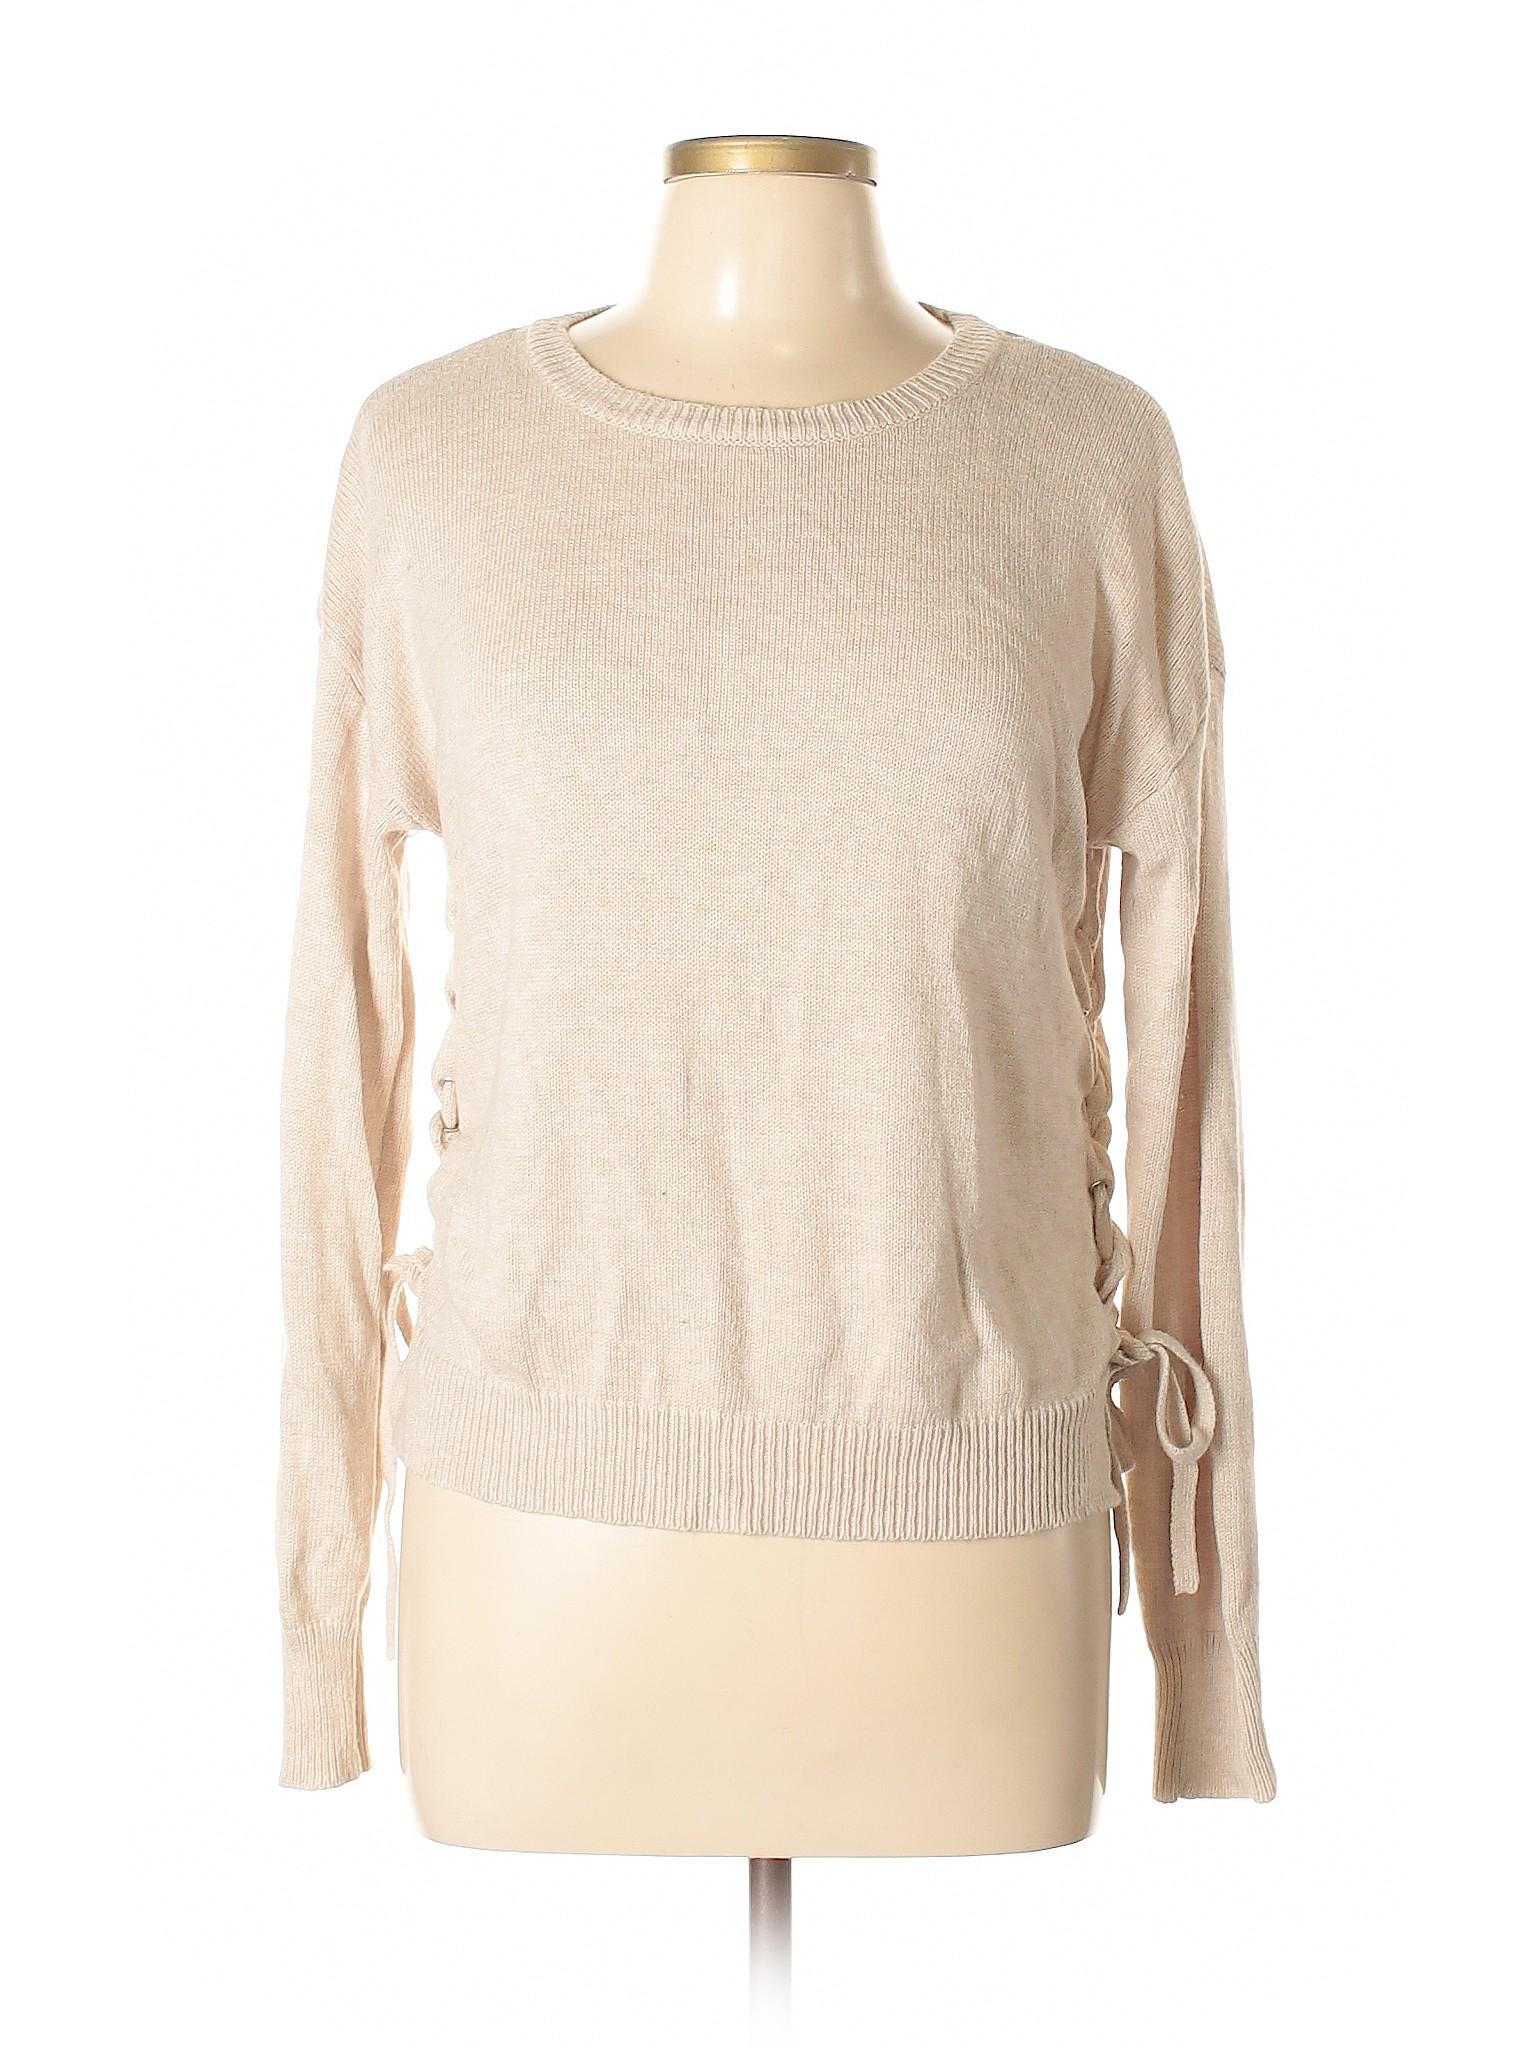 Sweater Forever Forever 21 Boutique 21 Sweater Boutique Pullover Pullover aBRq6x